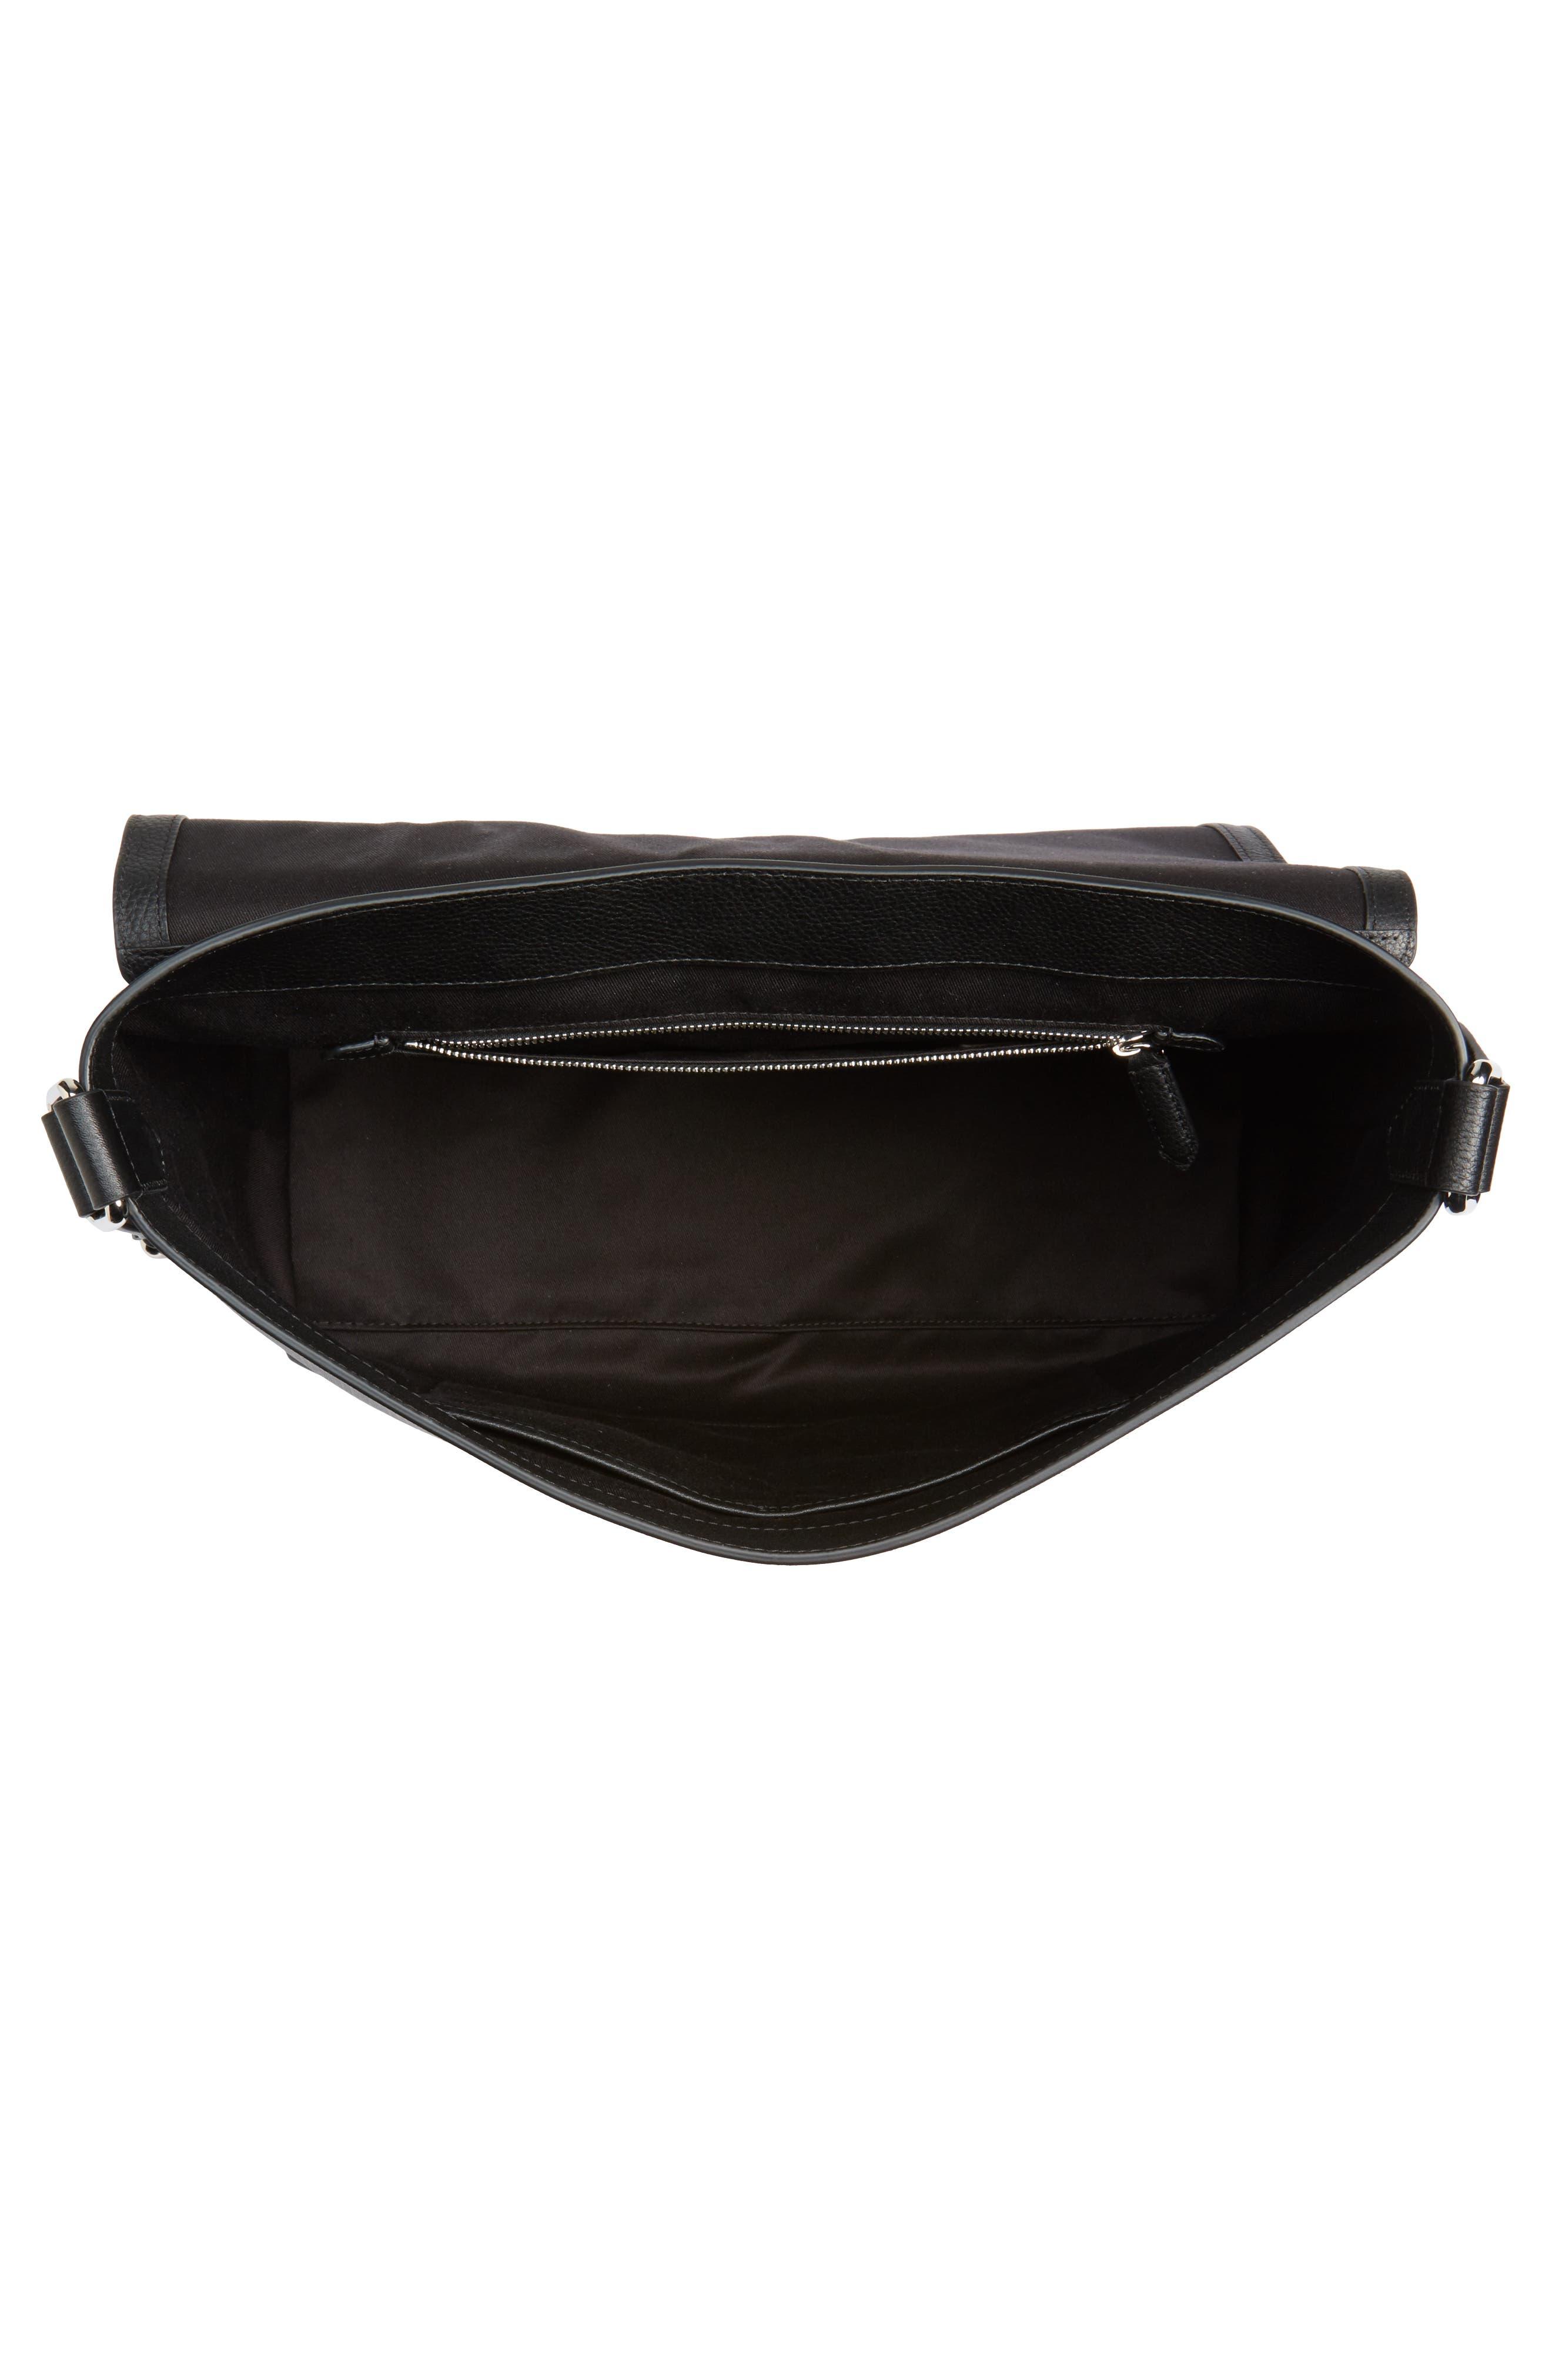 London Check Messenger Bag,                             Alternate thumbnail 4, color,                             Charcoal/ Black